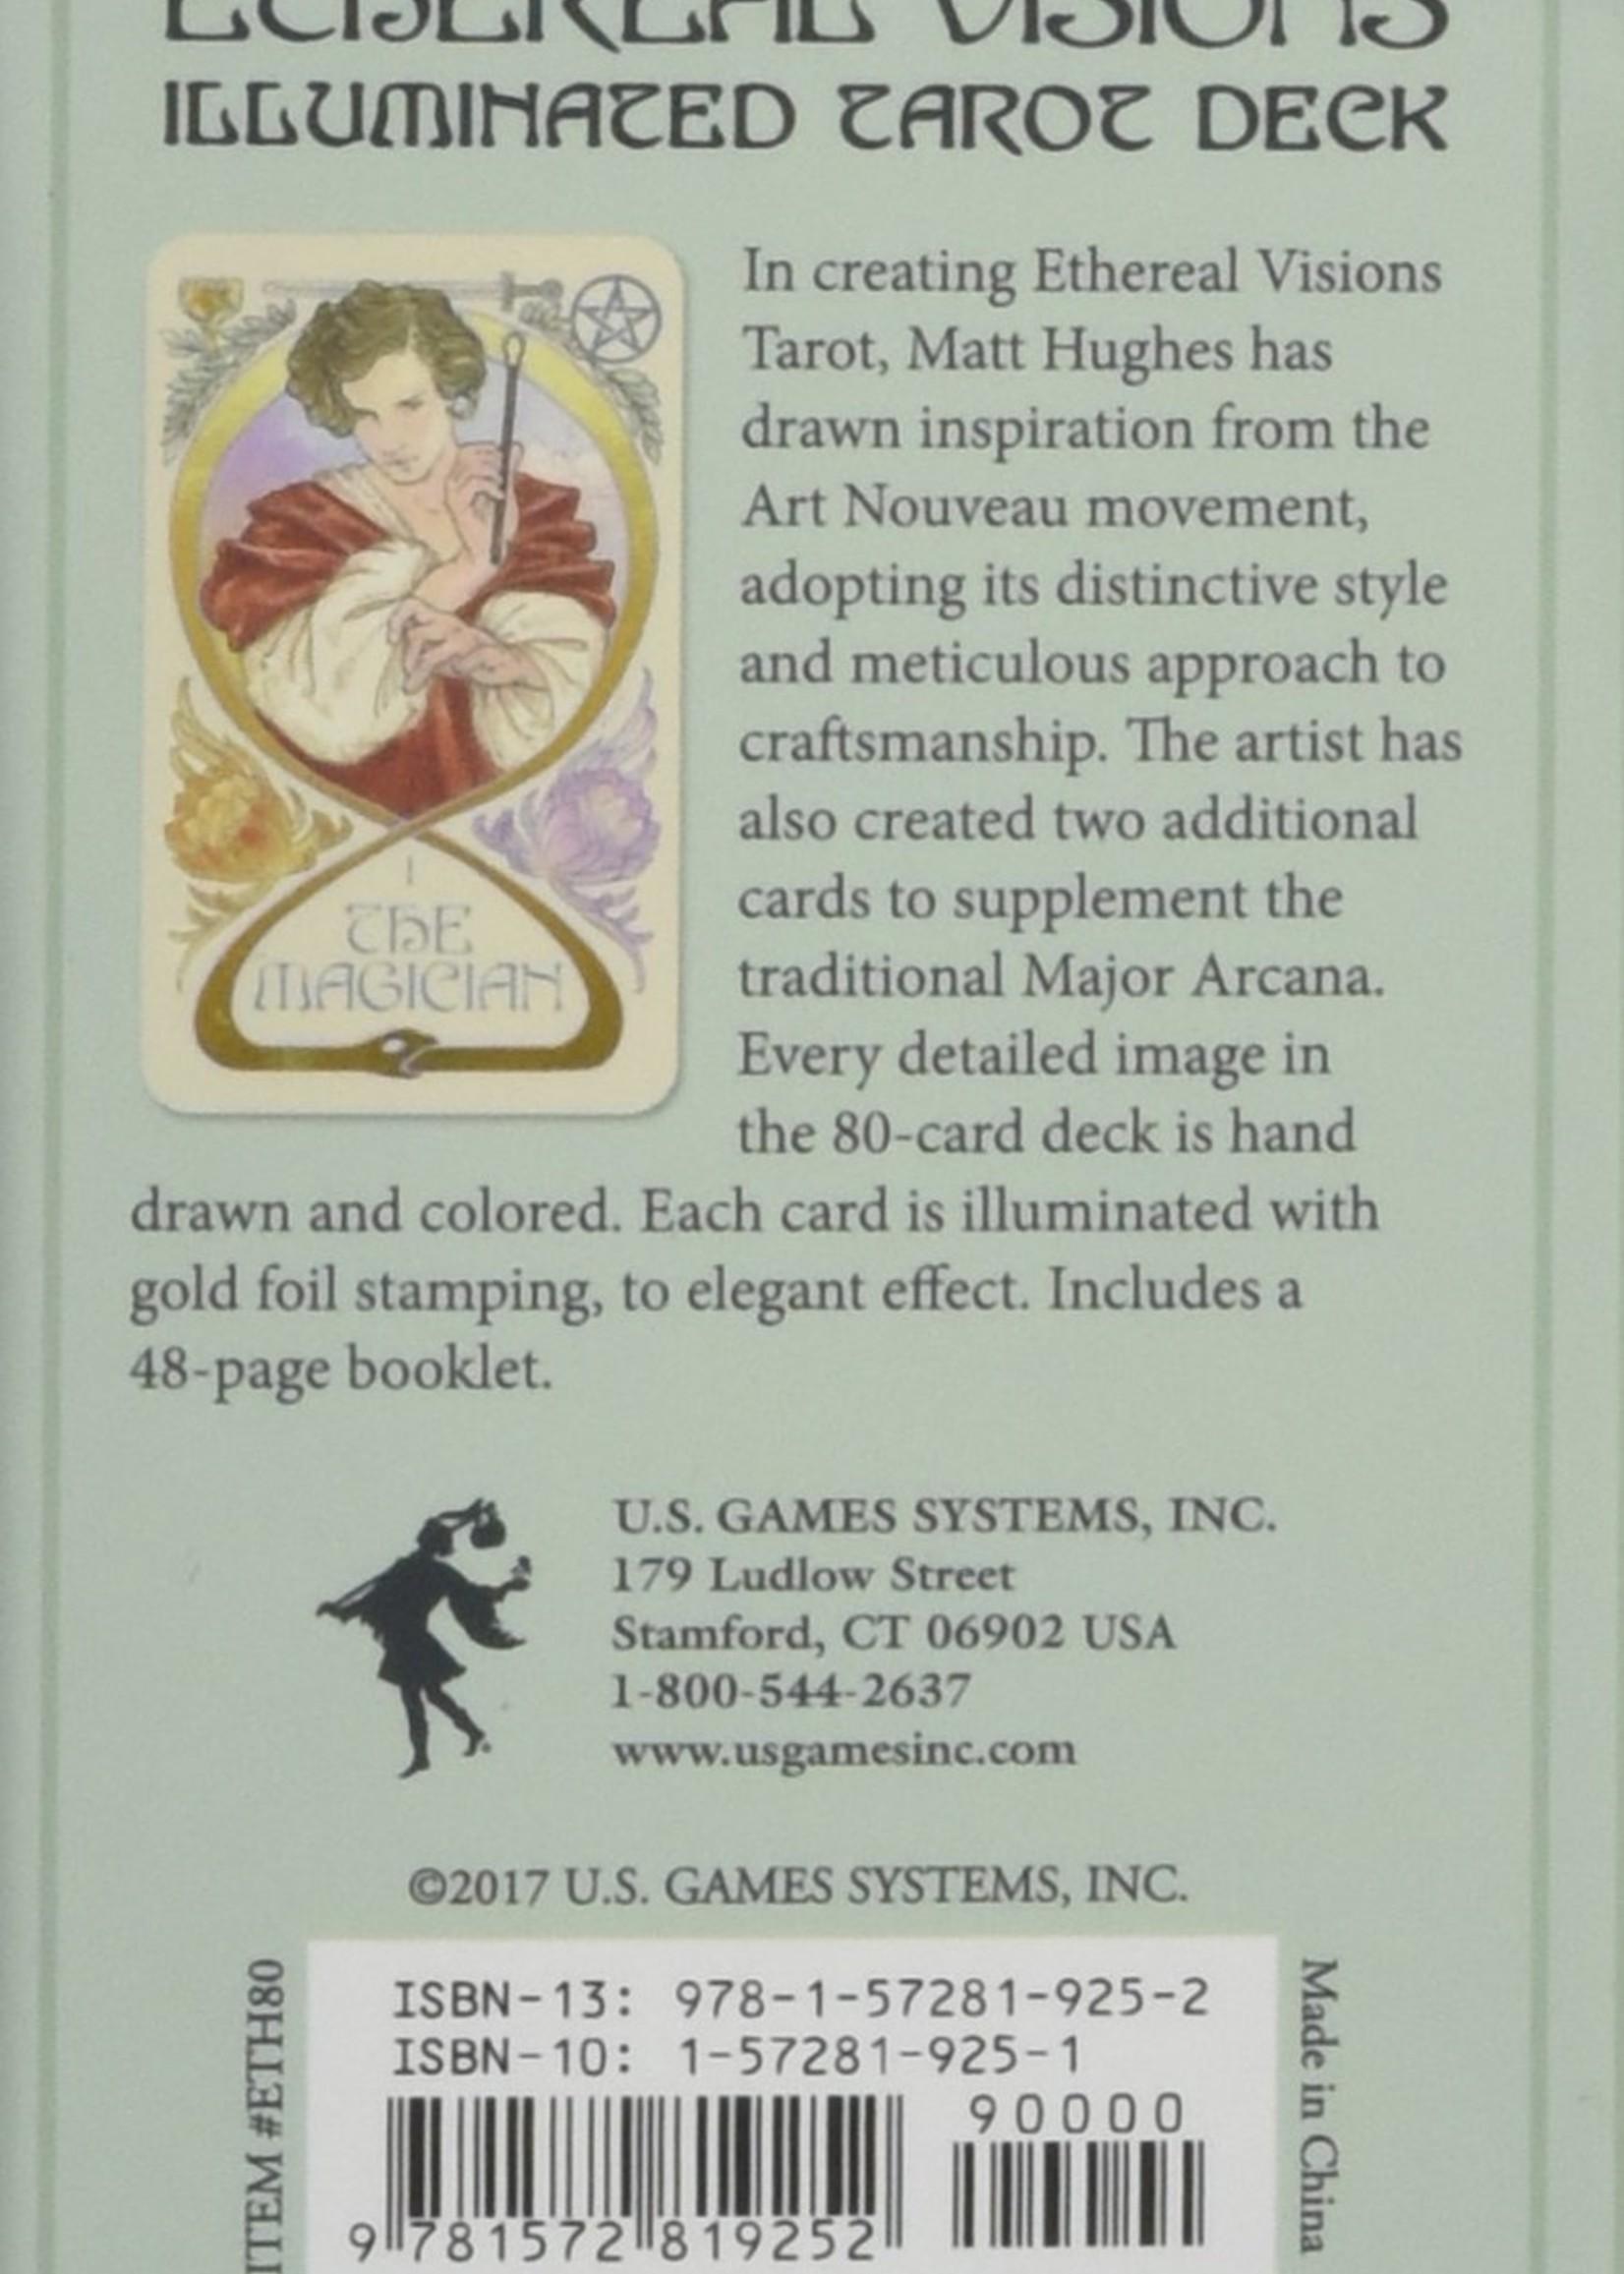 Deck Ethereal Visions: Illuminated Tarot